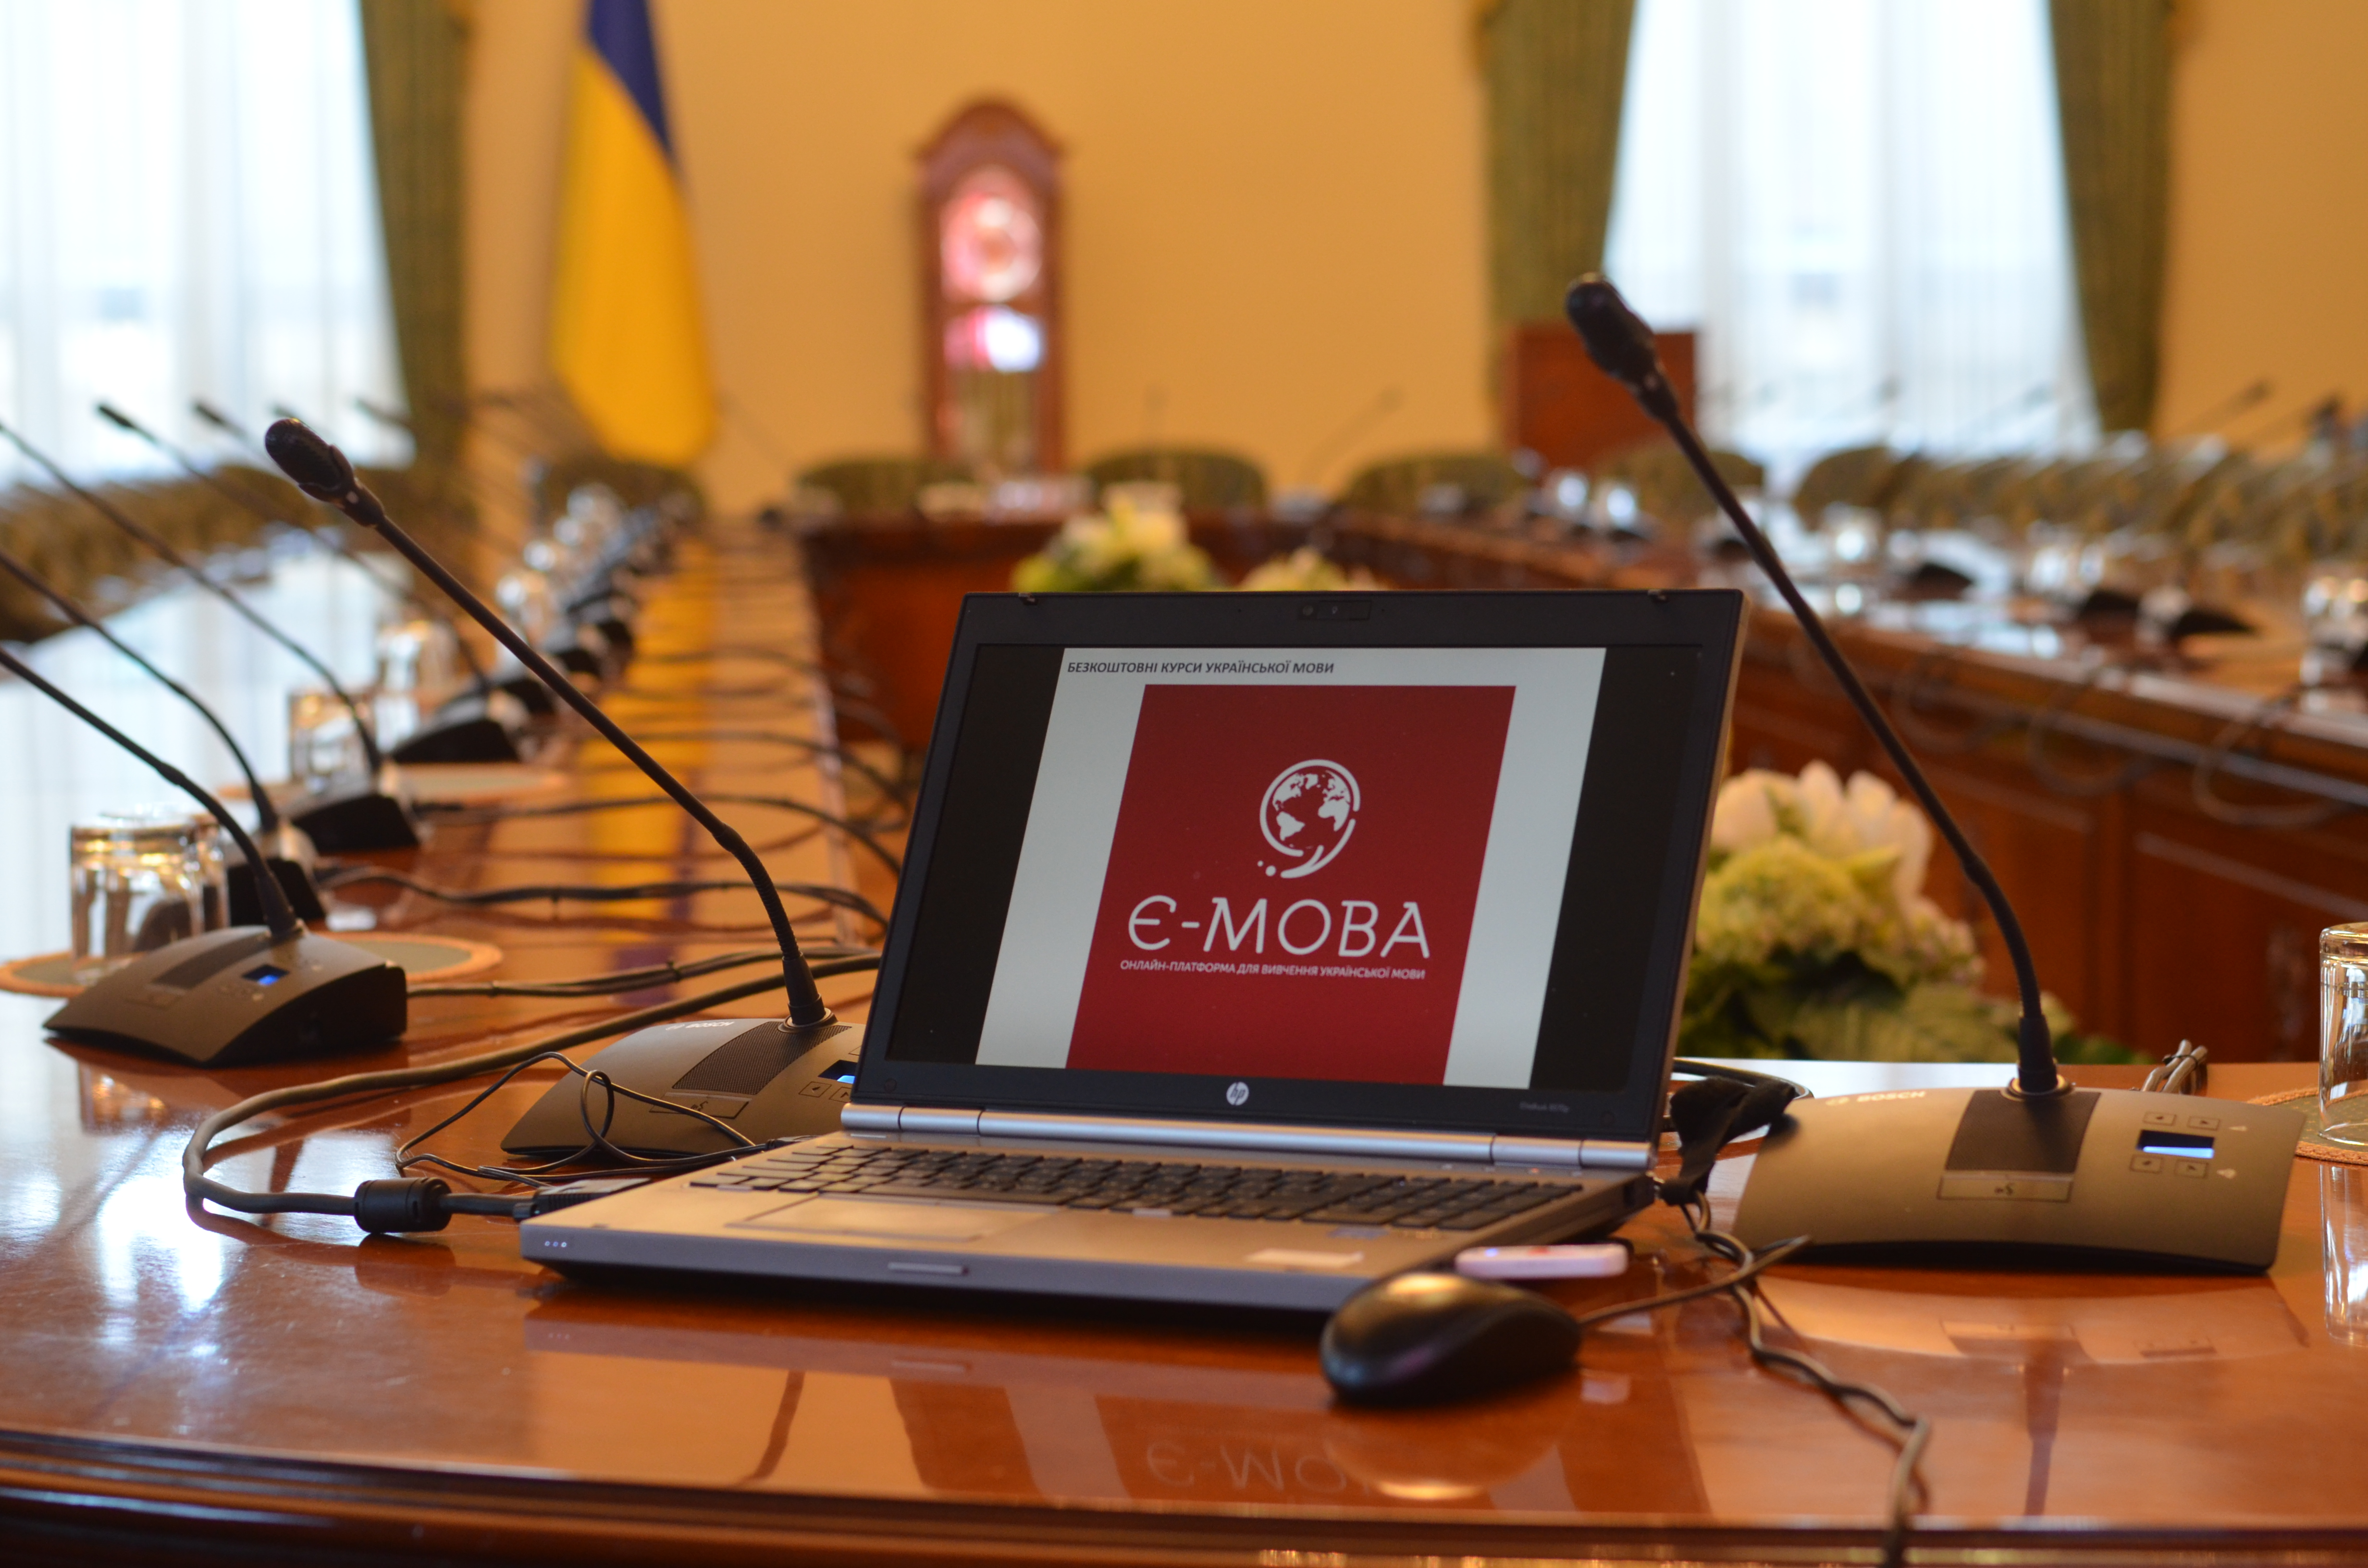 Platforma z vyvčennja ukraїnśkoї movy zbyraje košty dlja rozvytku proektu